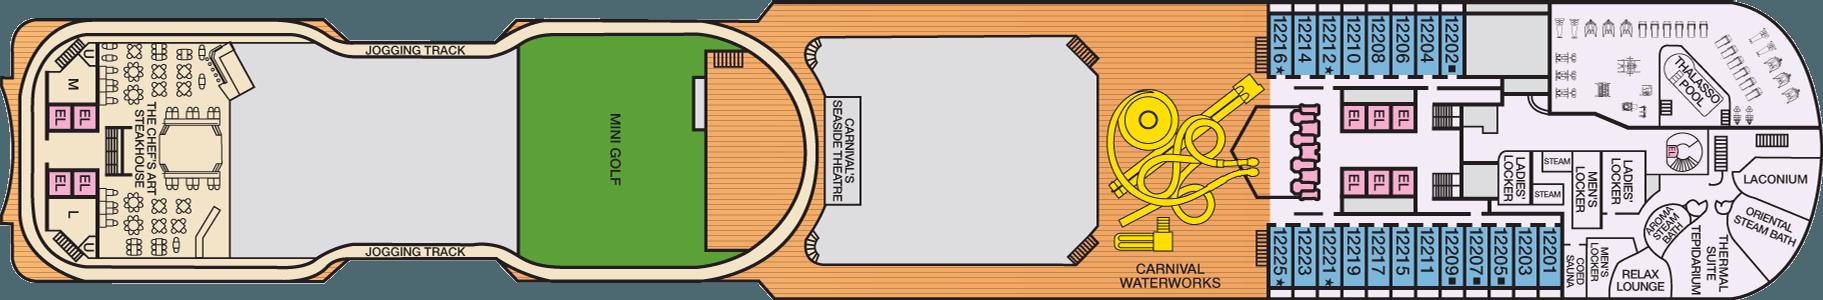 Deck 12 Spa